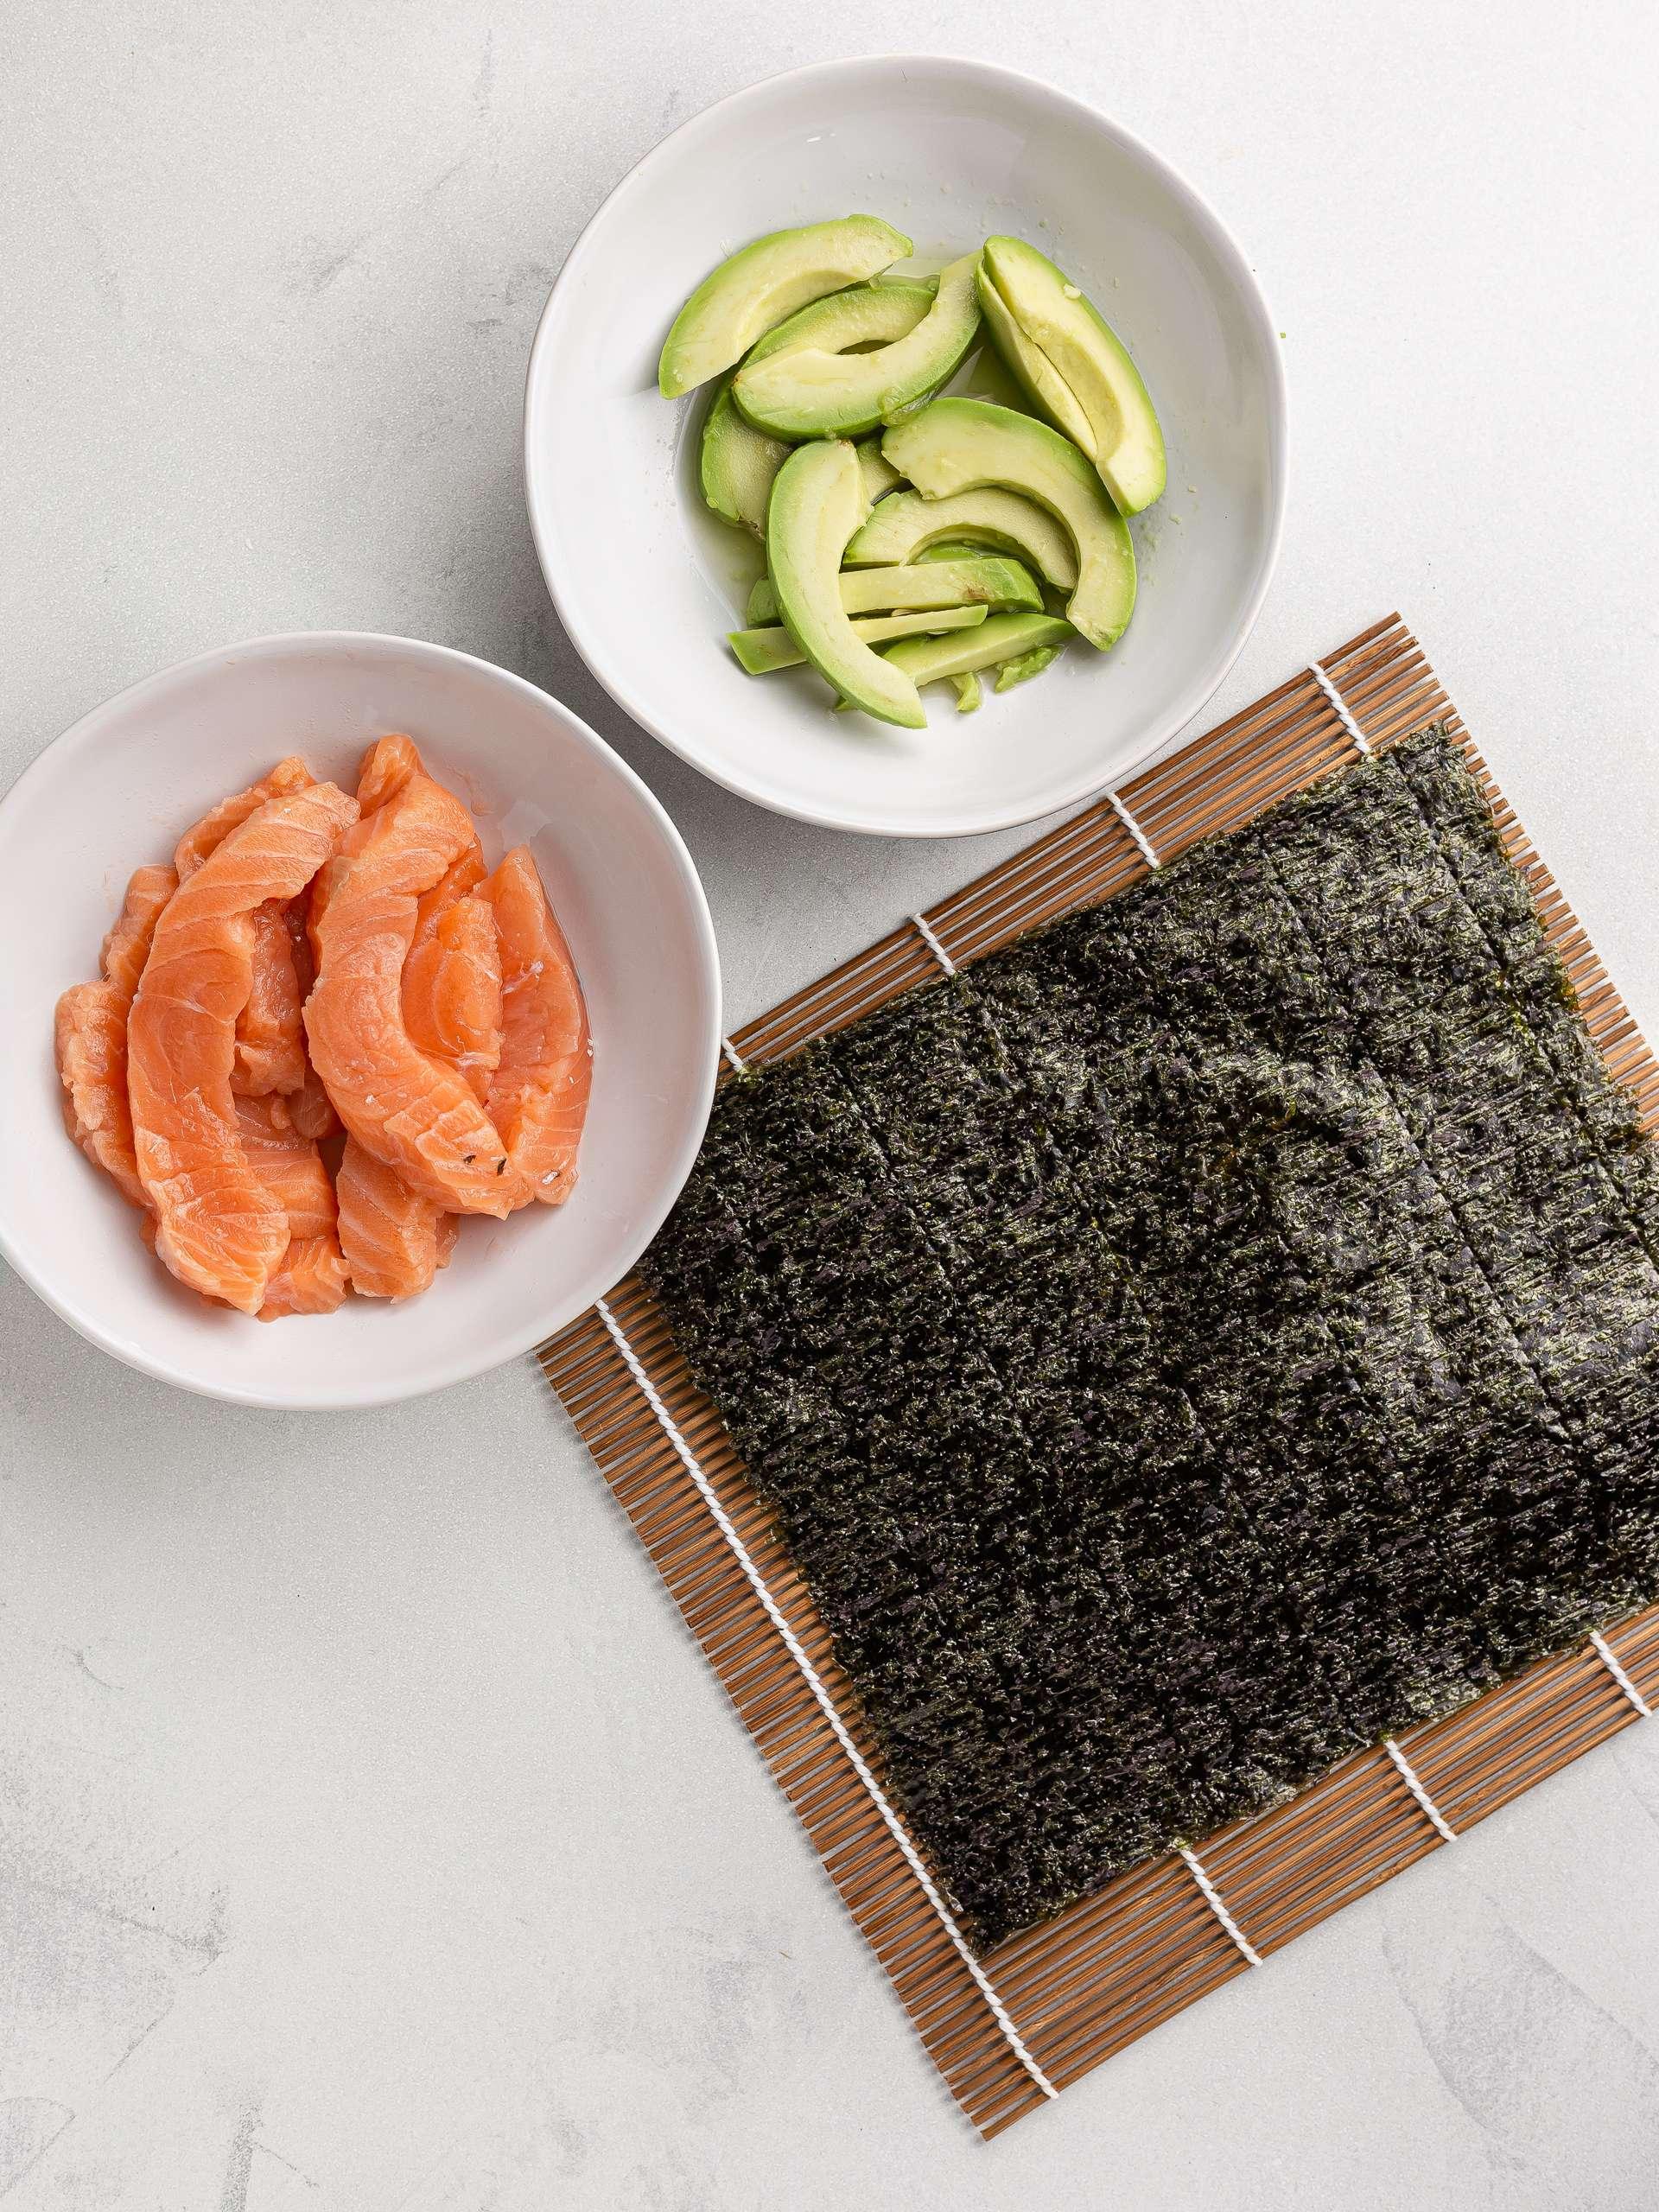 salmon, avocado and nori sheet for sushi